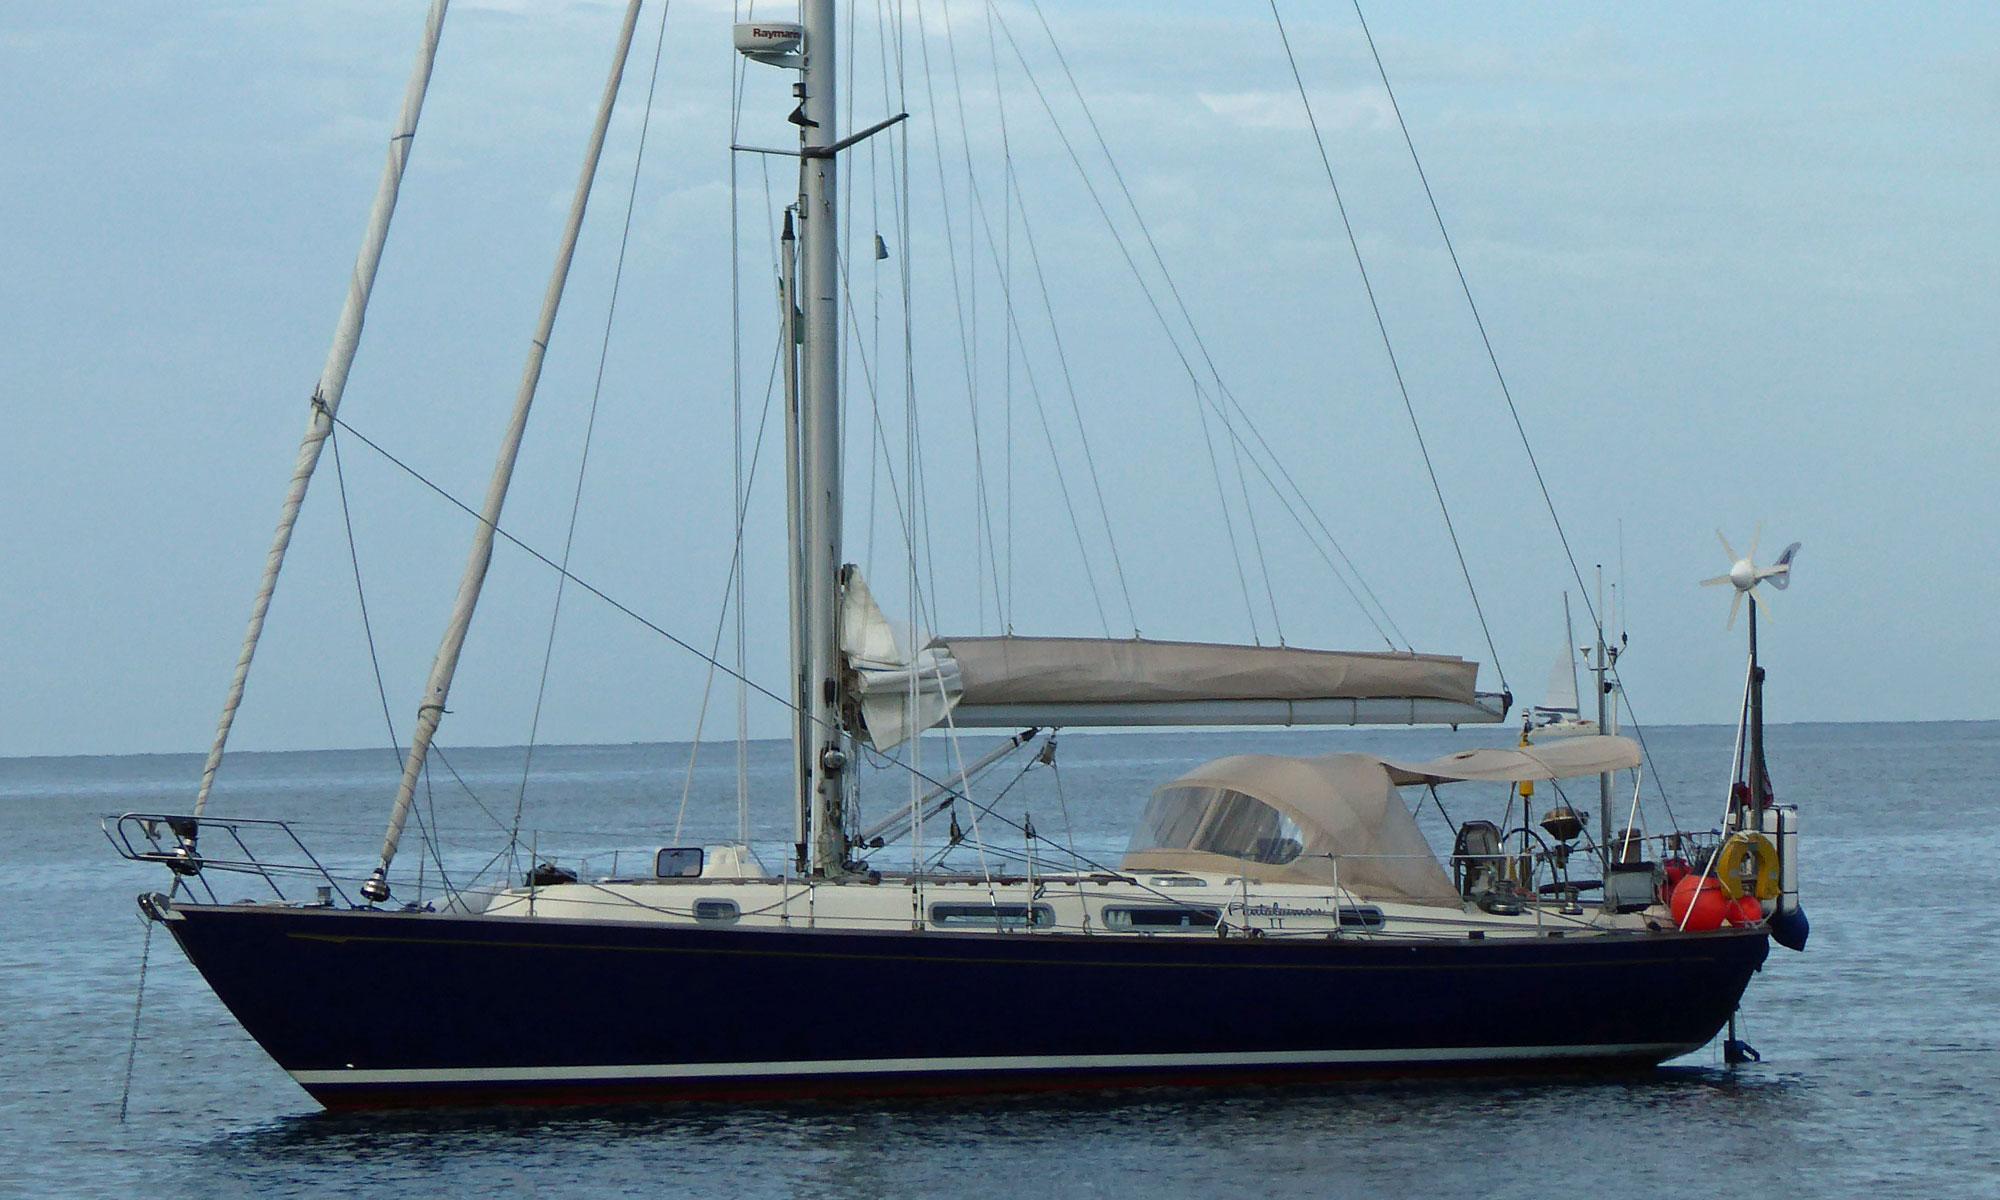 A Rustler 42 sailboat at anchor